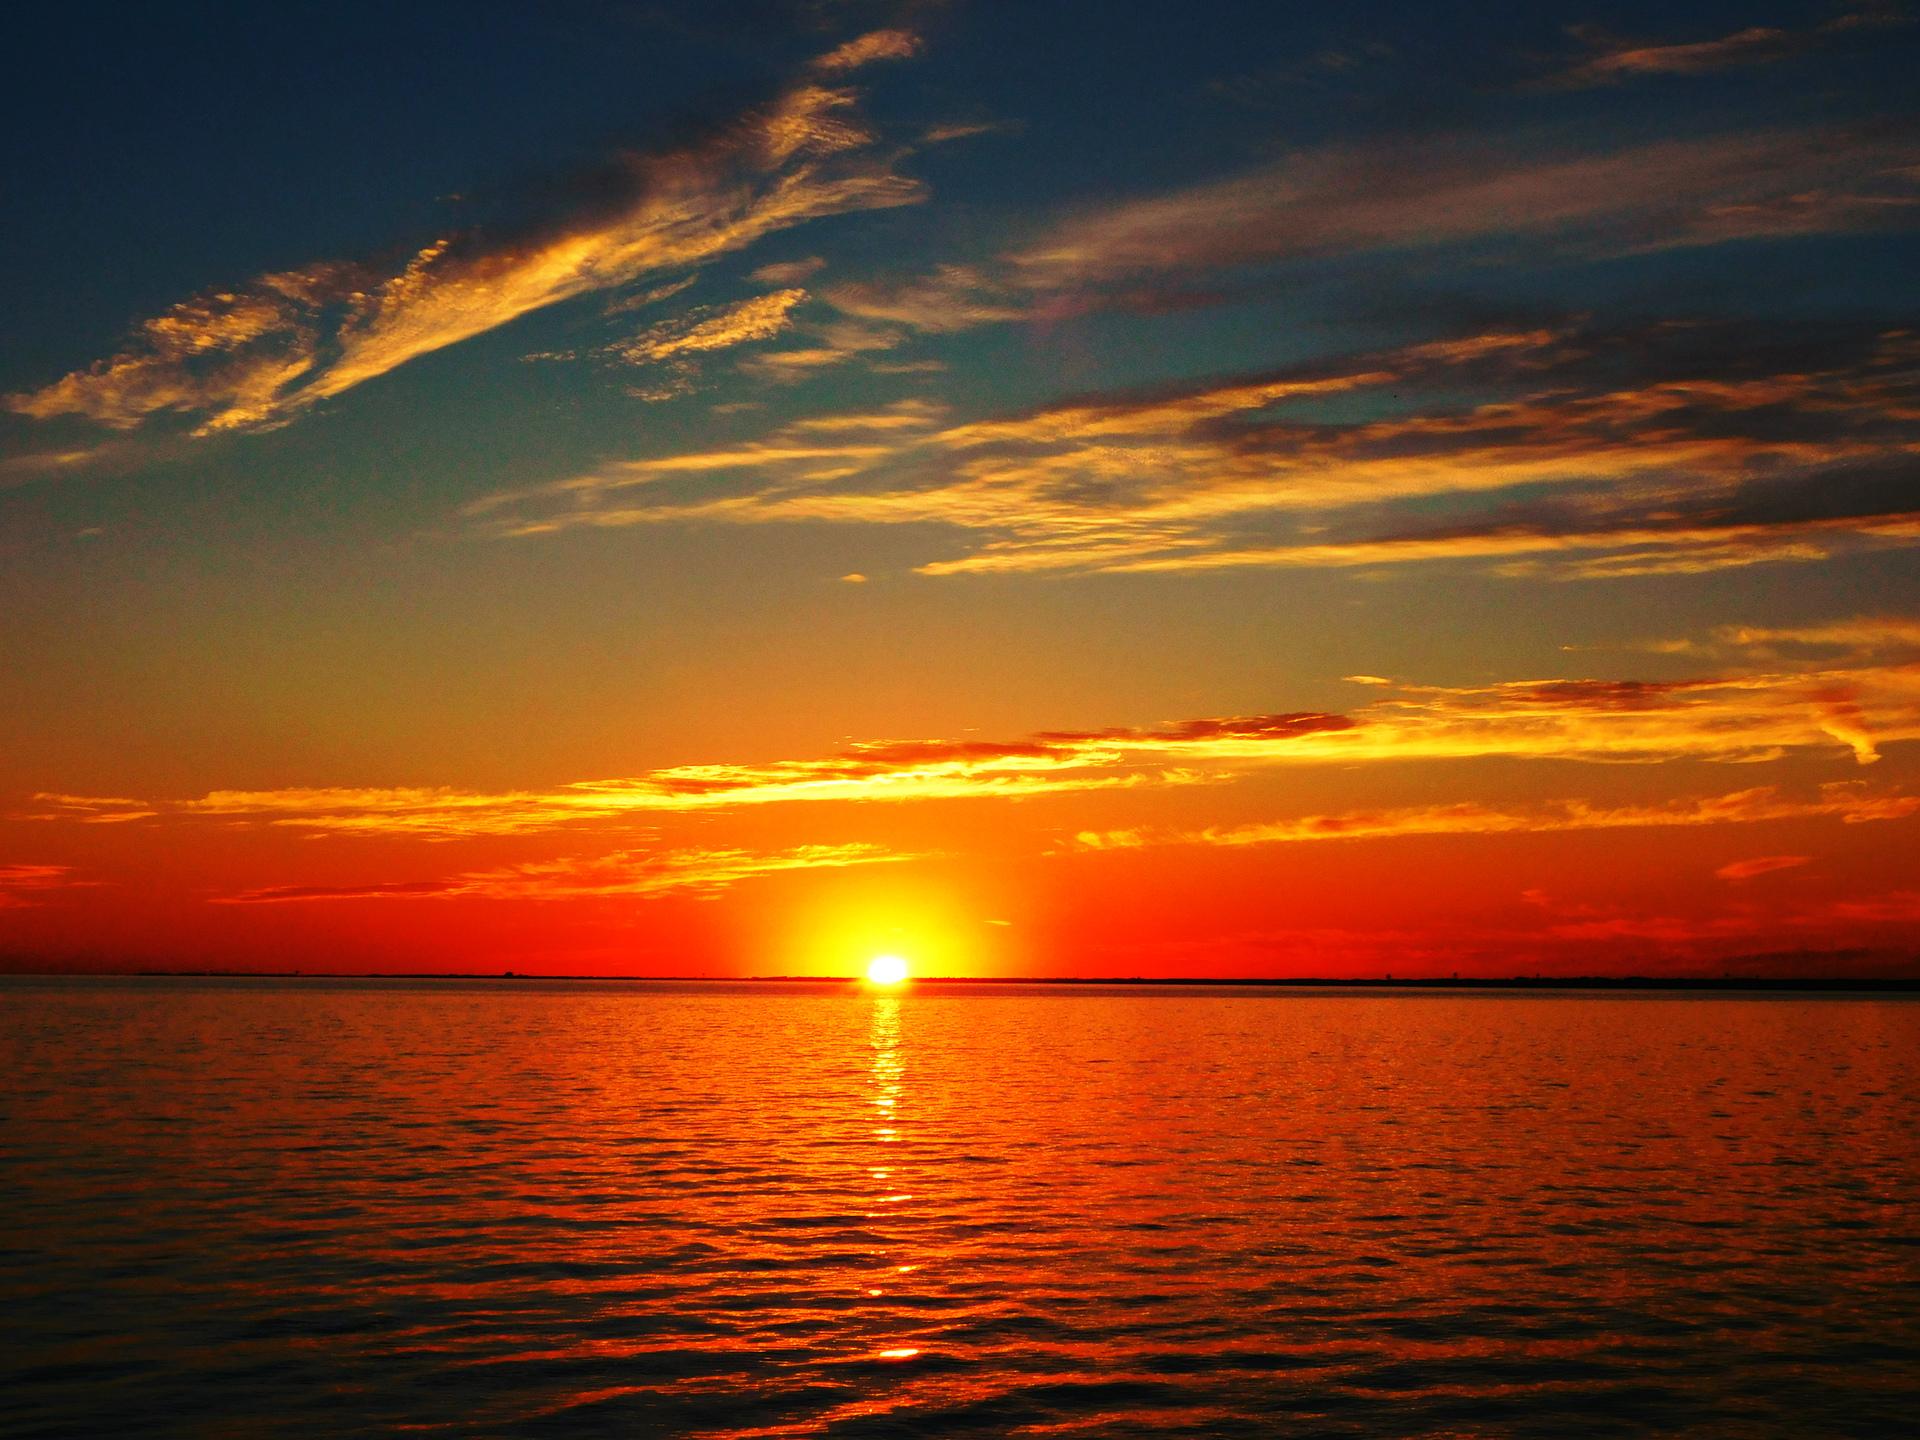 Dramatic sky during sunset | sea, beach, water, idyllic